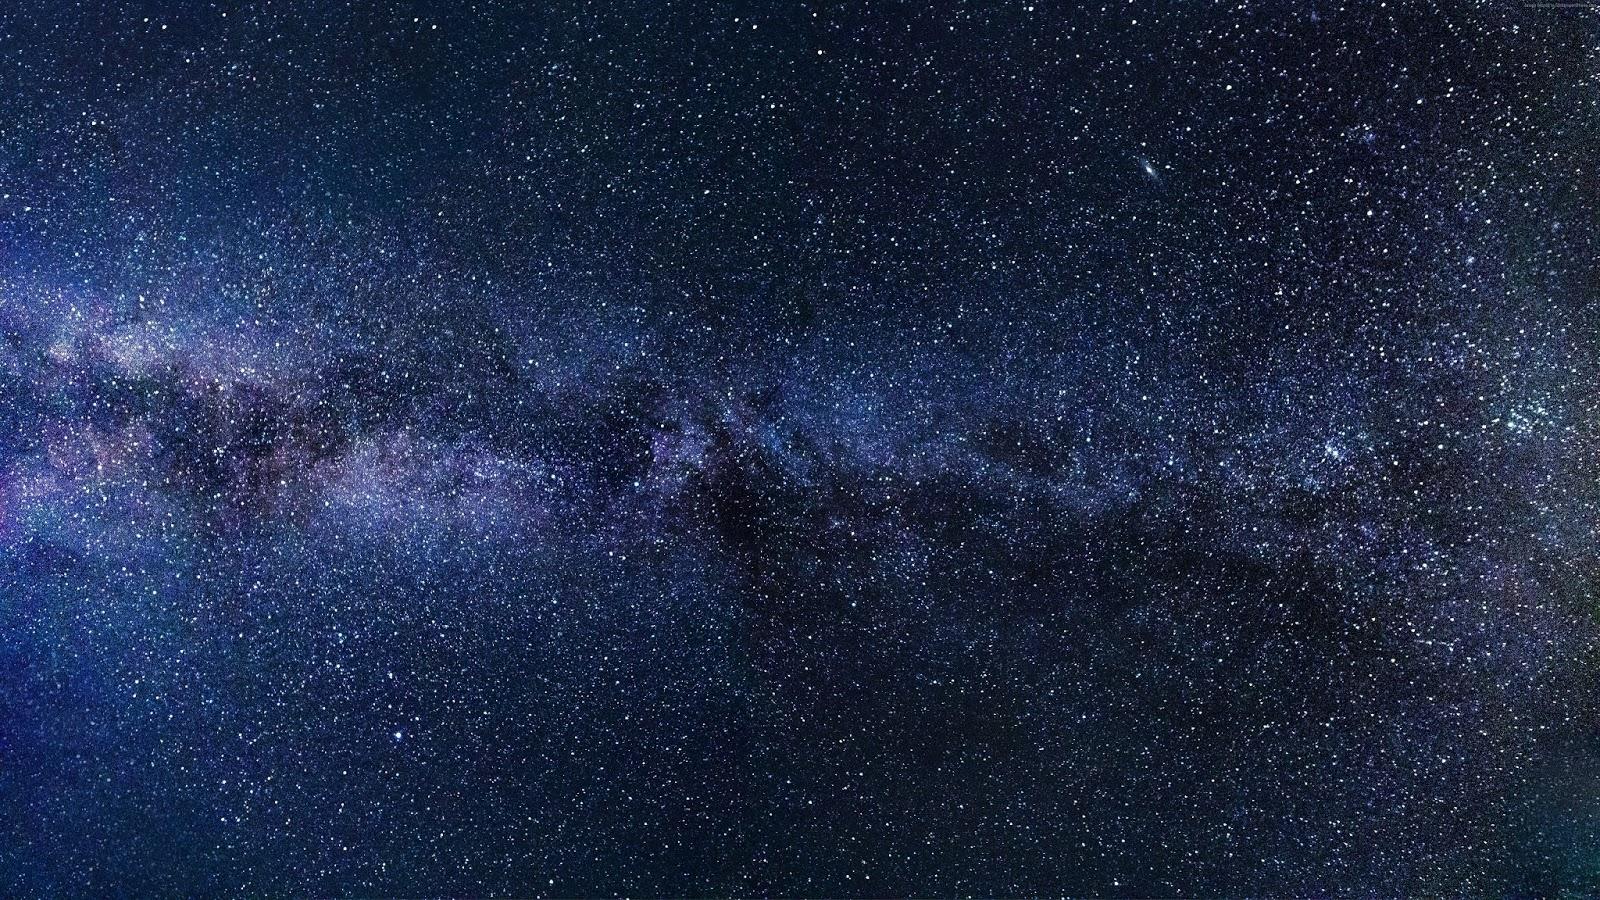 Milky Way 5K - MKBHD 5K Wallpaper